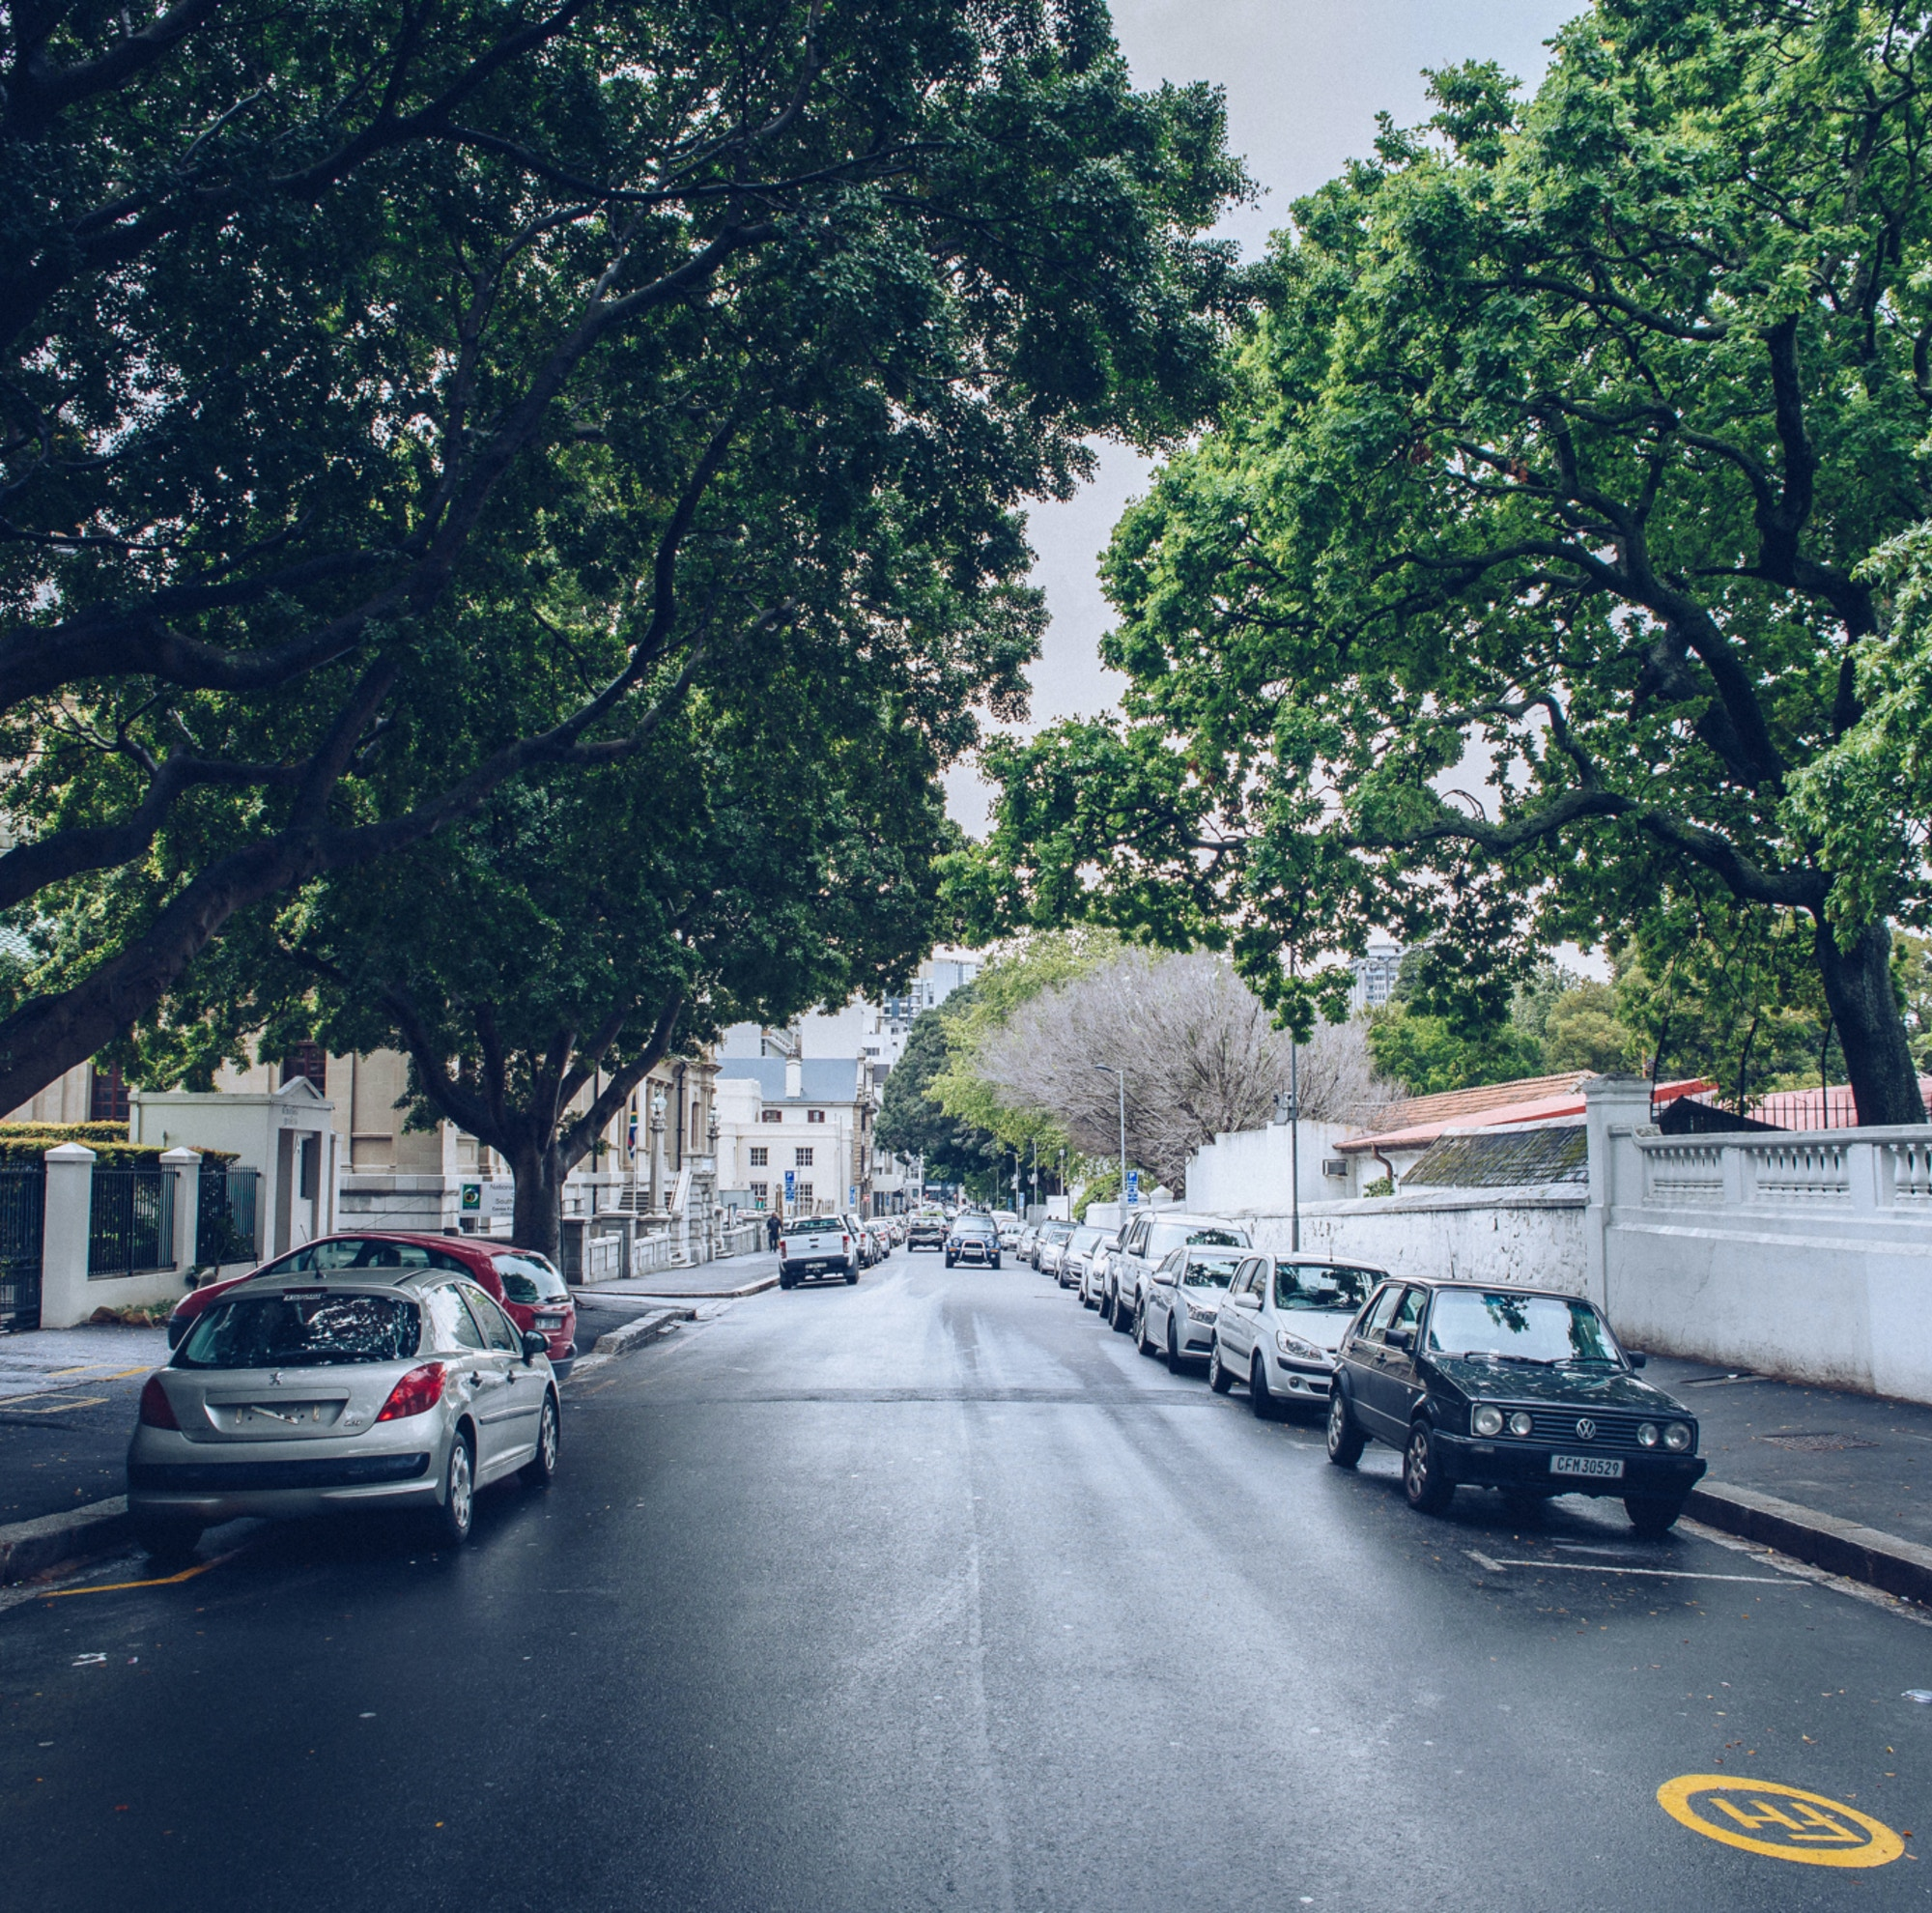 Street in the CBD